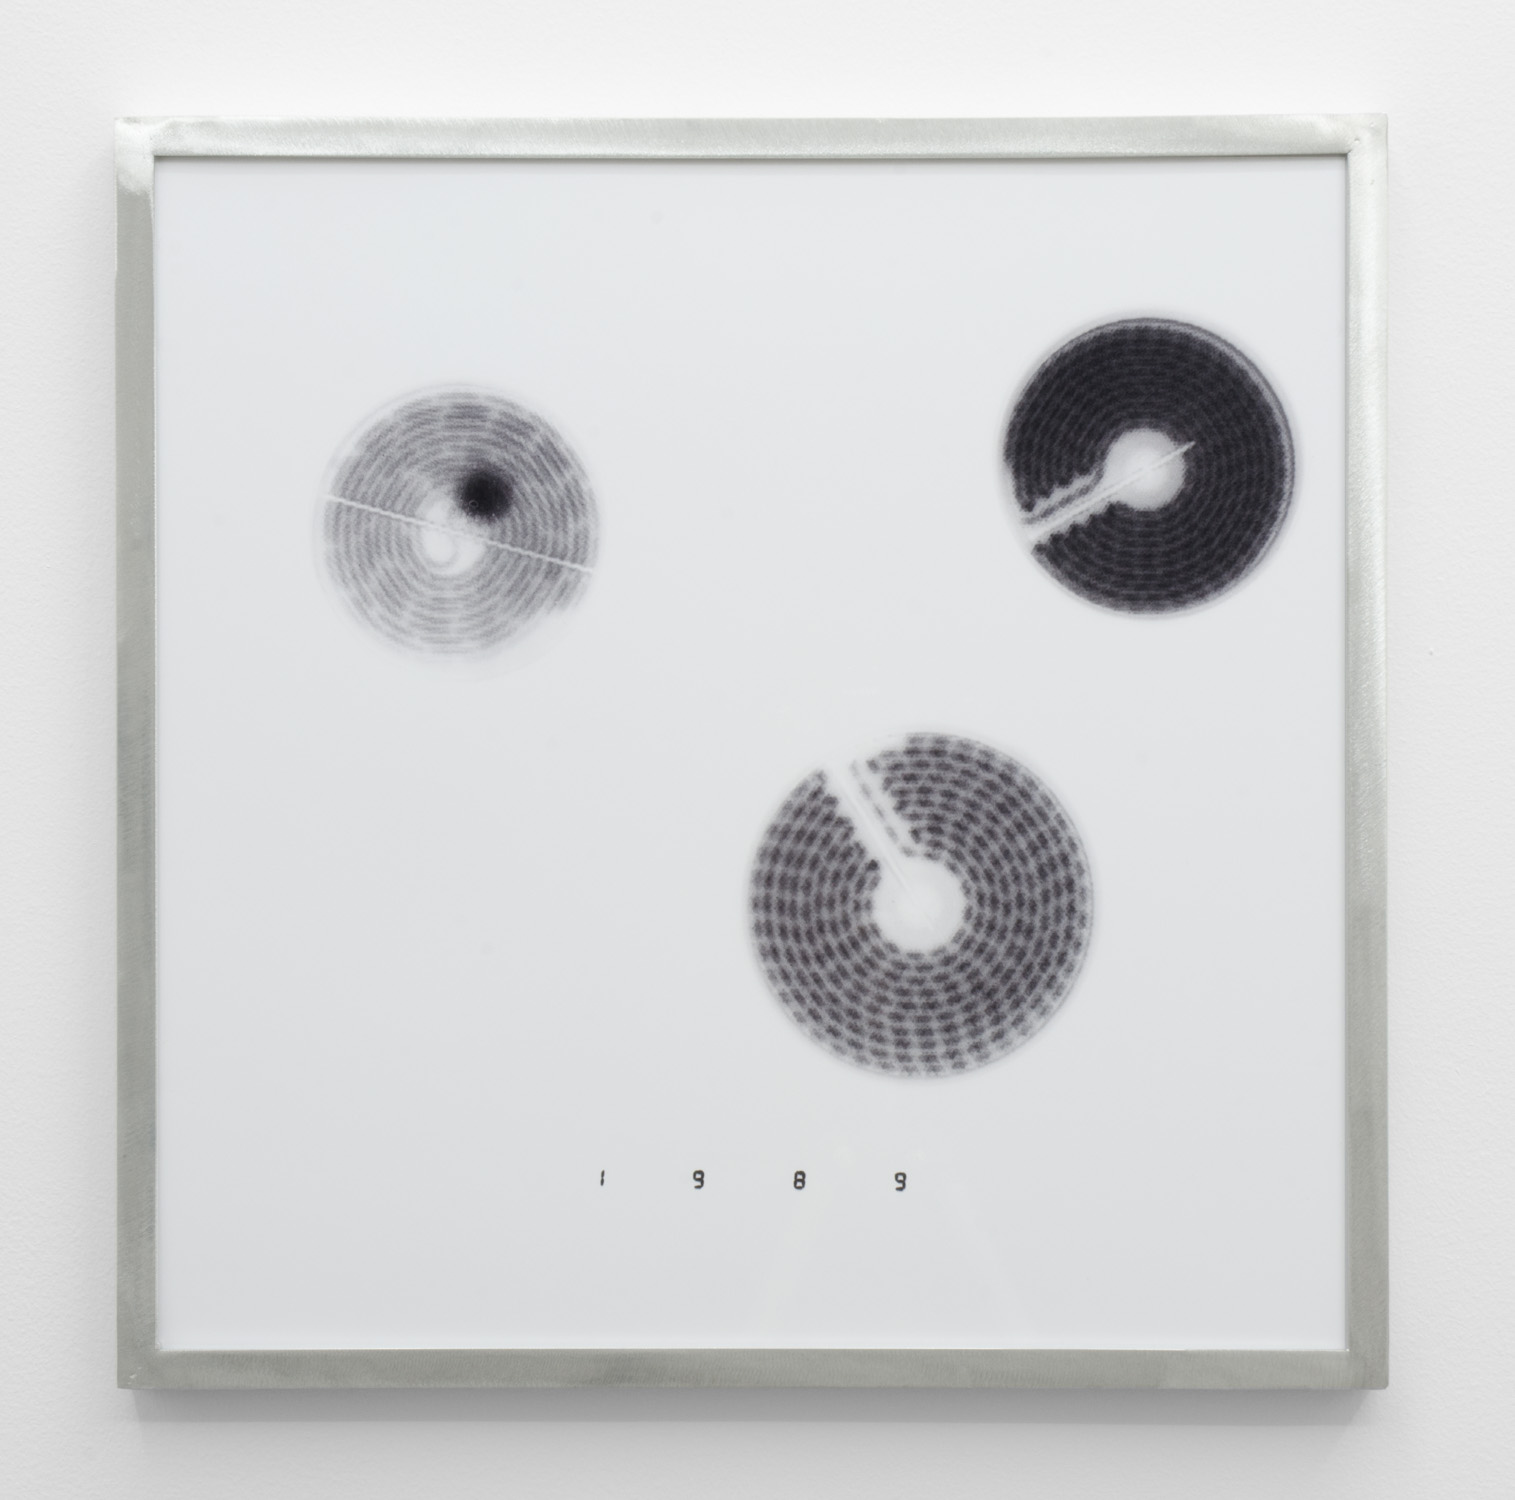 IR-5 , 2014, giclee print on hahnemuhle photorag, custom aluminium frame 40 x 40 cm.